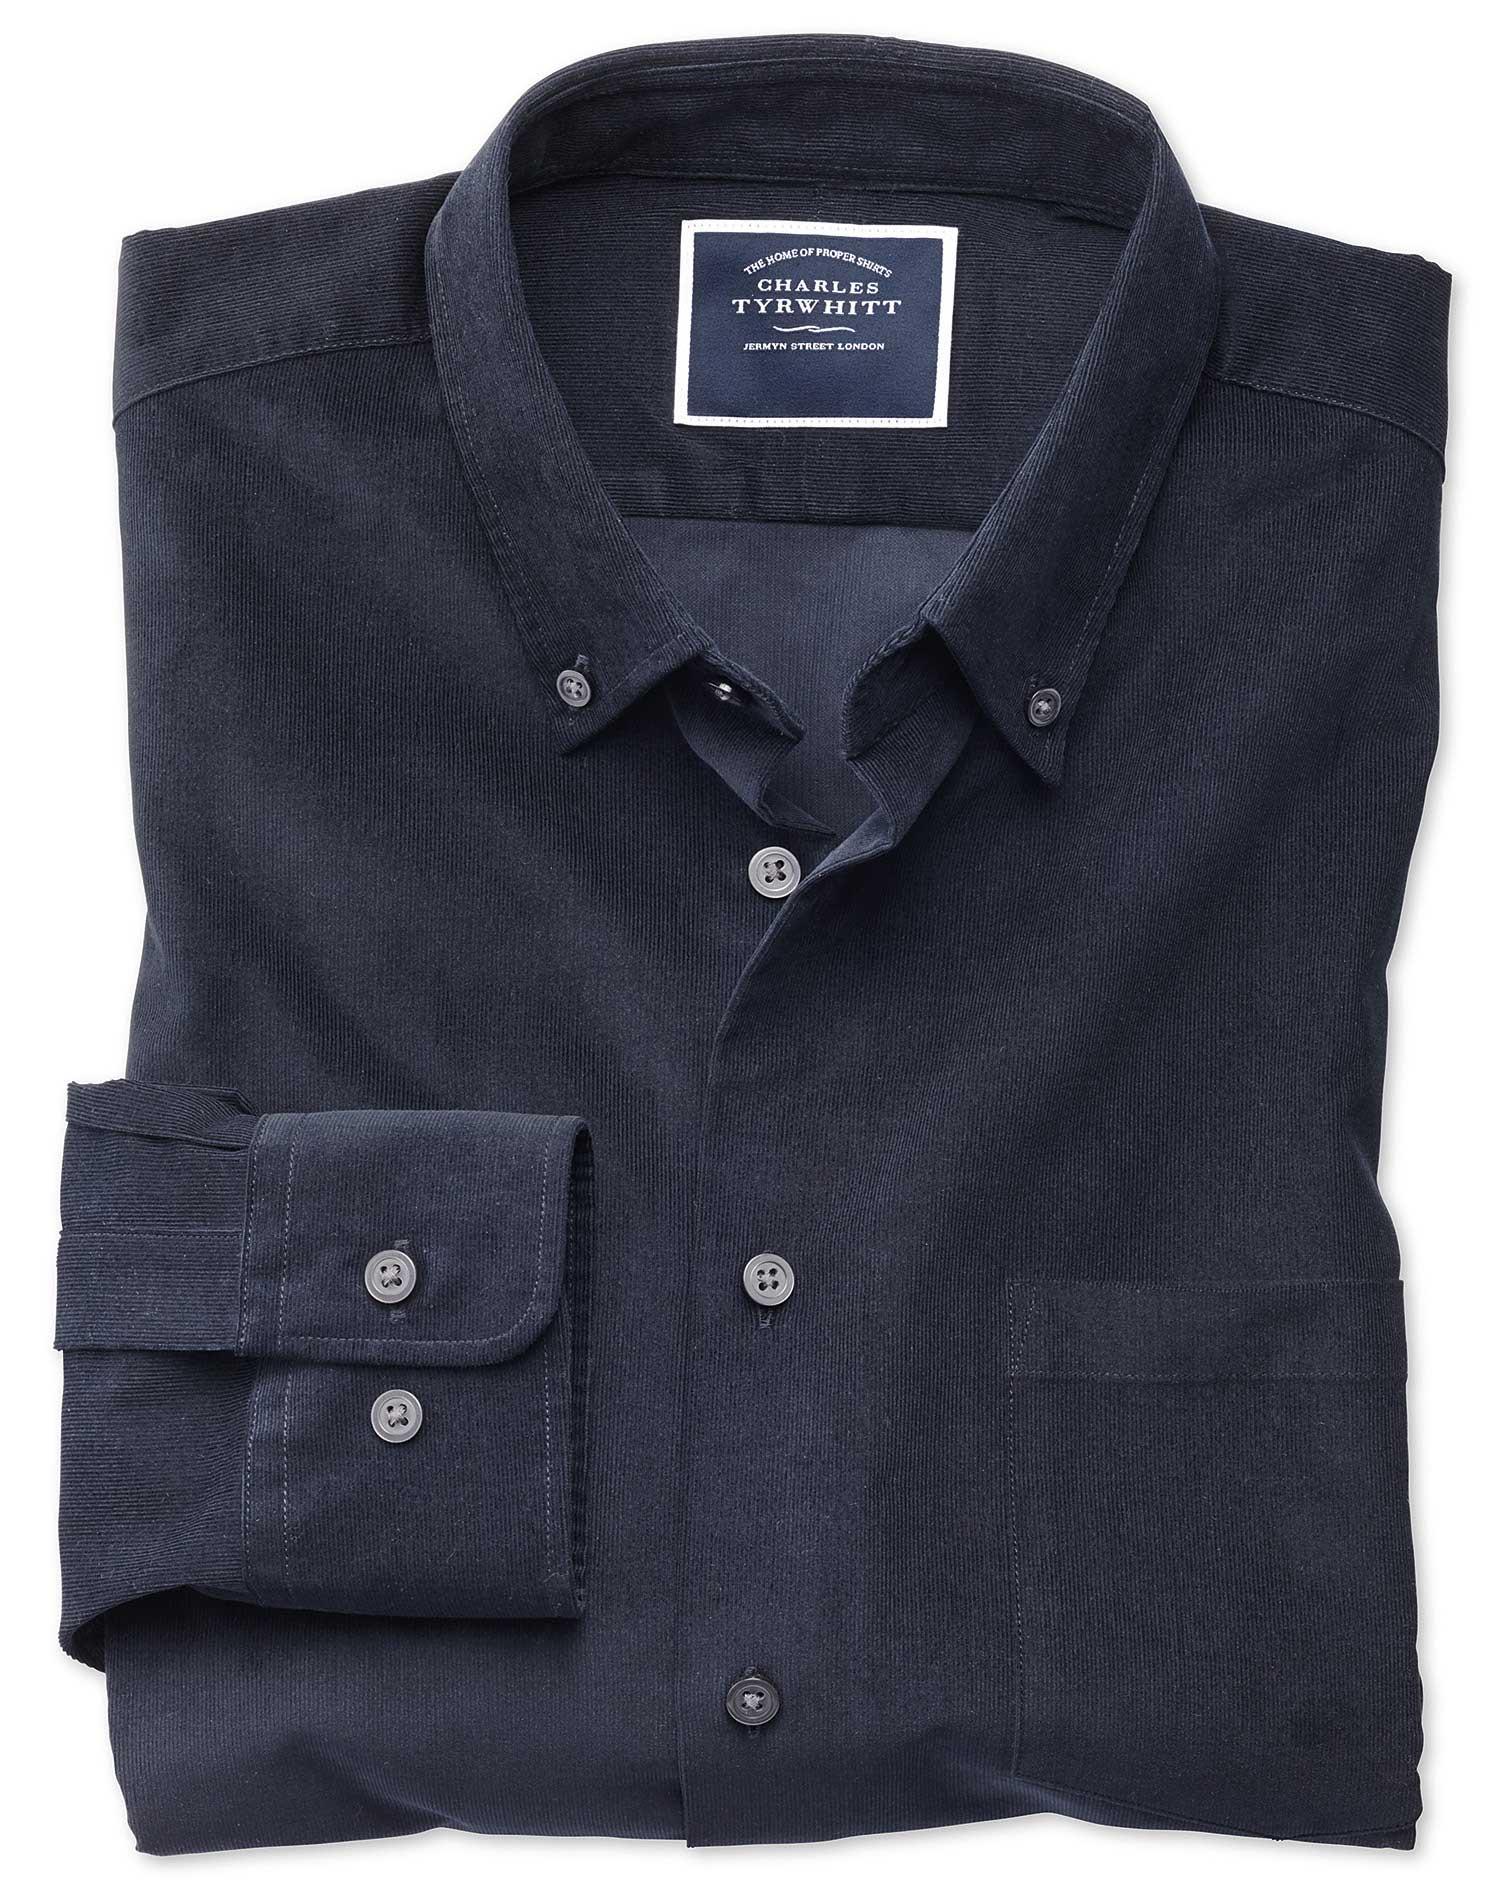 Extra Slim Fit Plain Navy Fine Corduroy Cotton Shirt Single Cuff Size Large by Charles Tyrwhitt